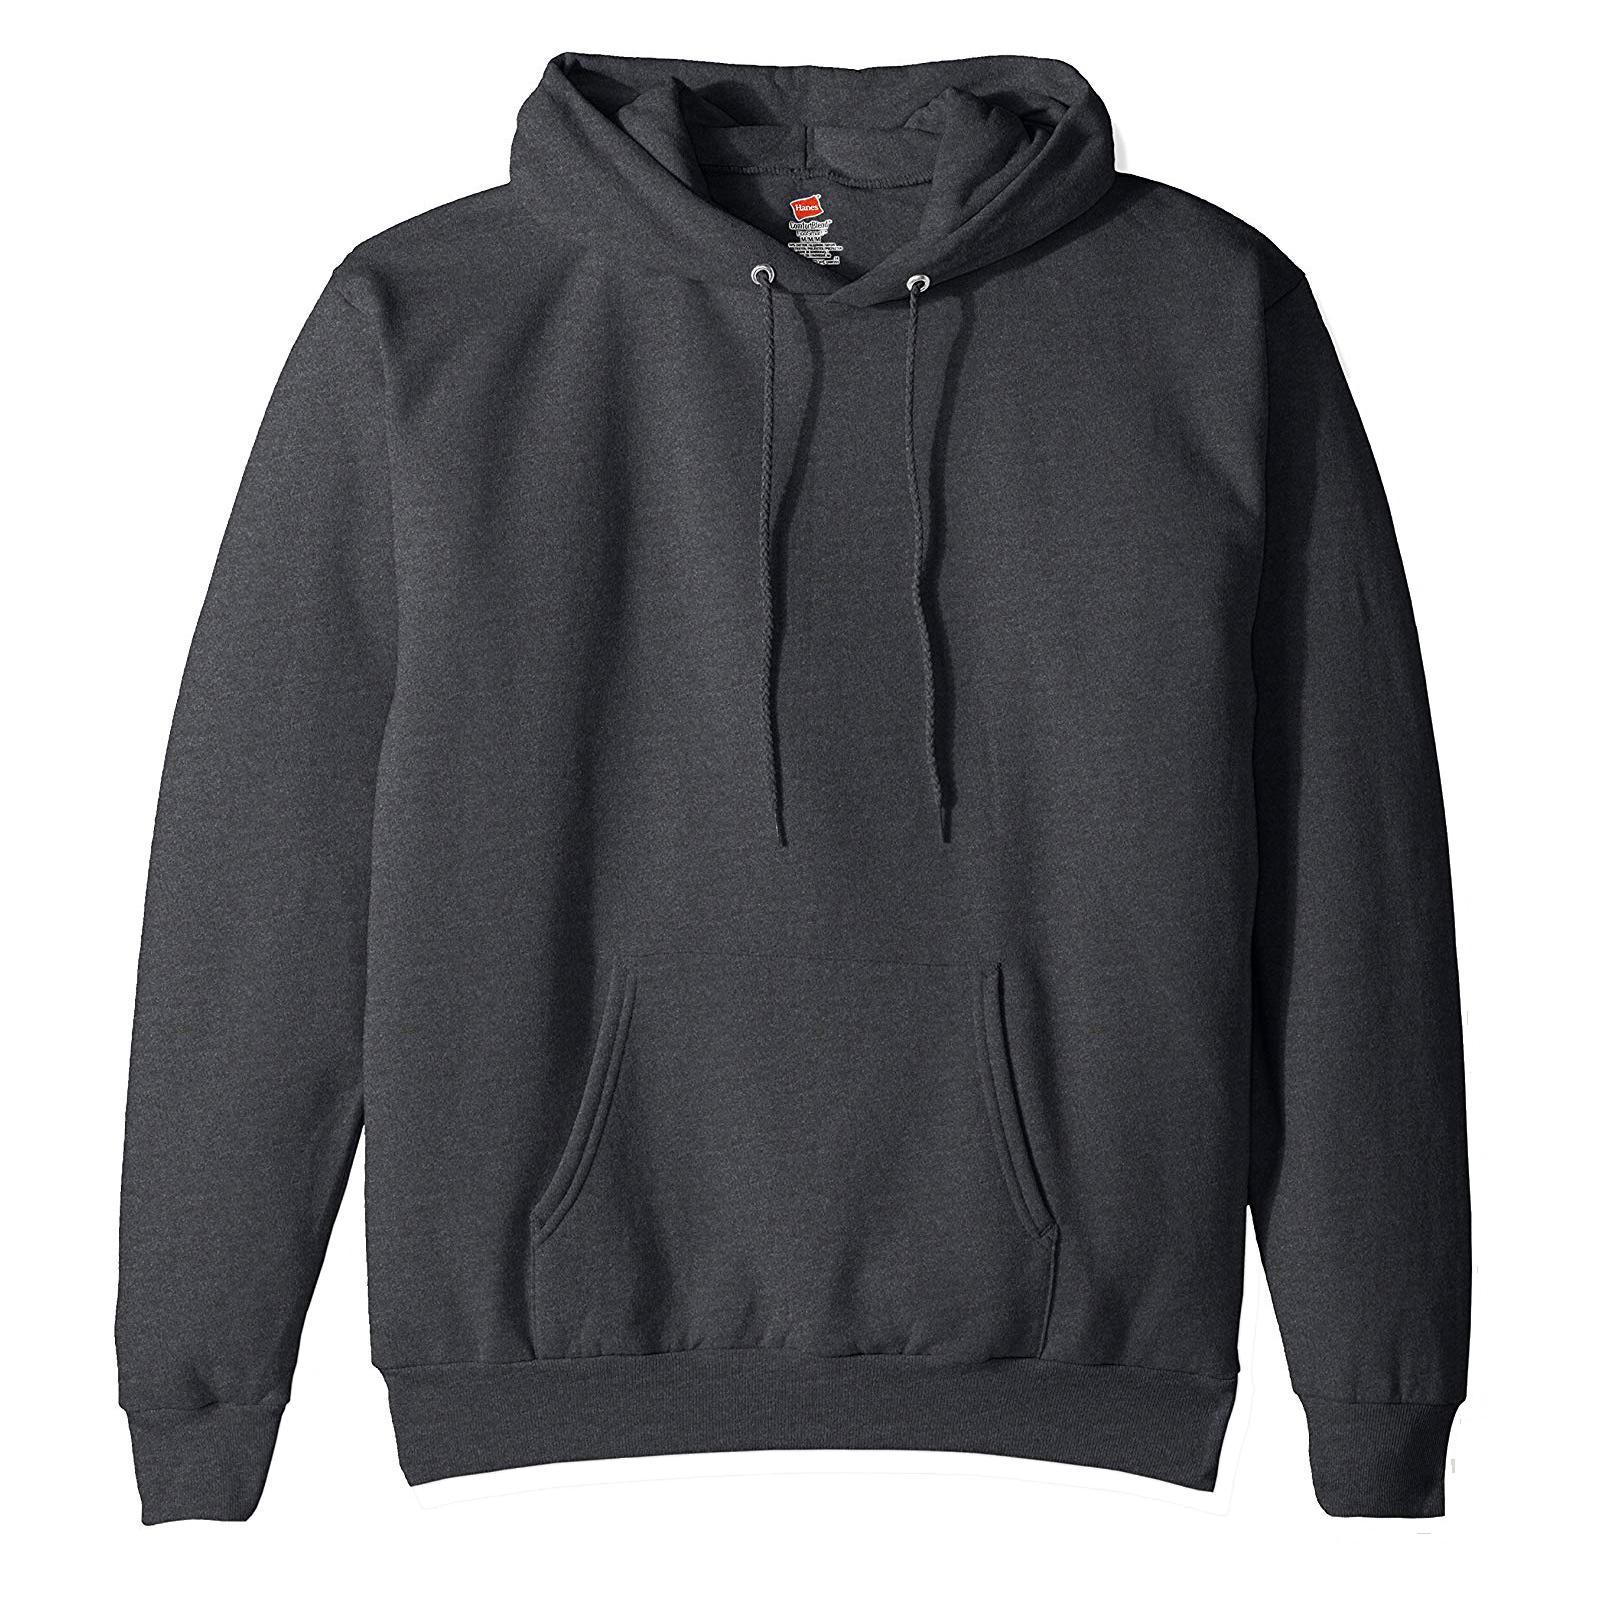 hanes-mens-pullover-ecosmart-fleece-hooded-sweatshirt.jpg